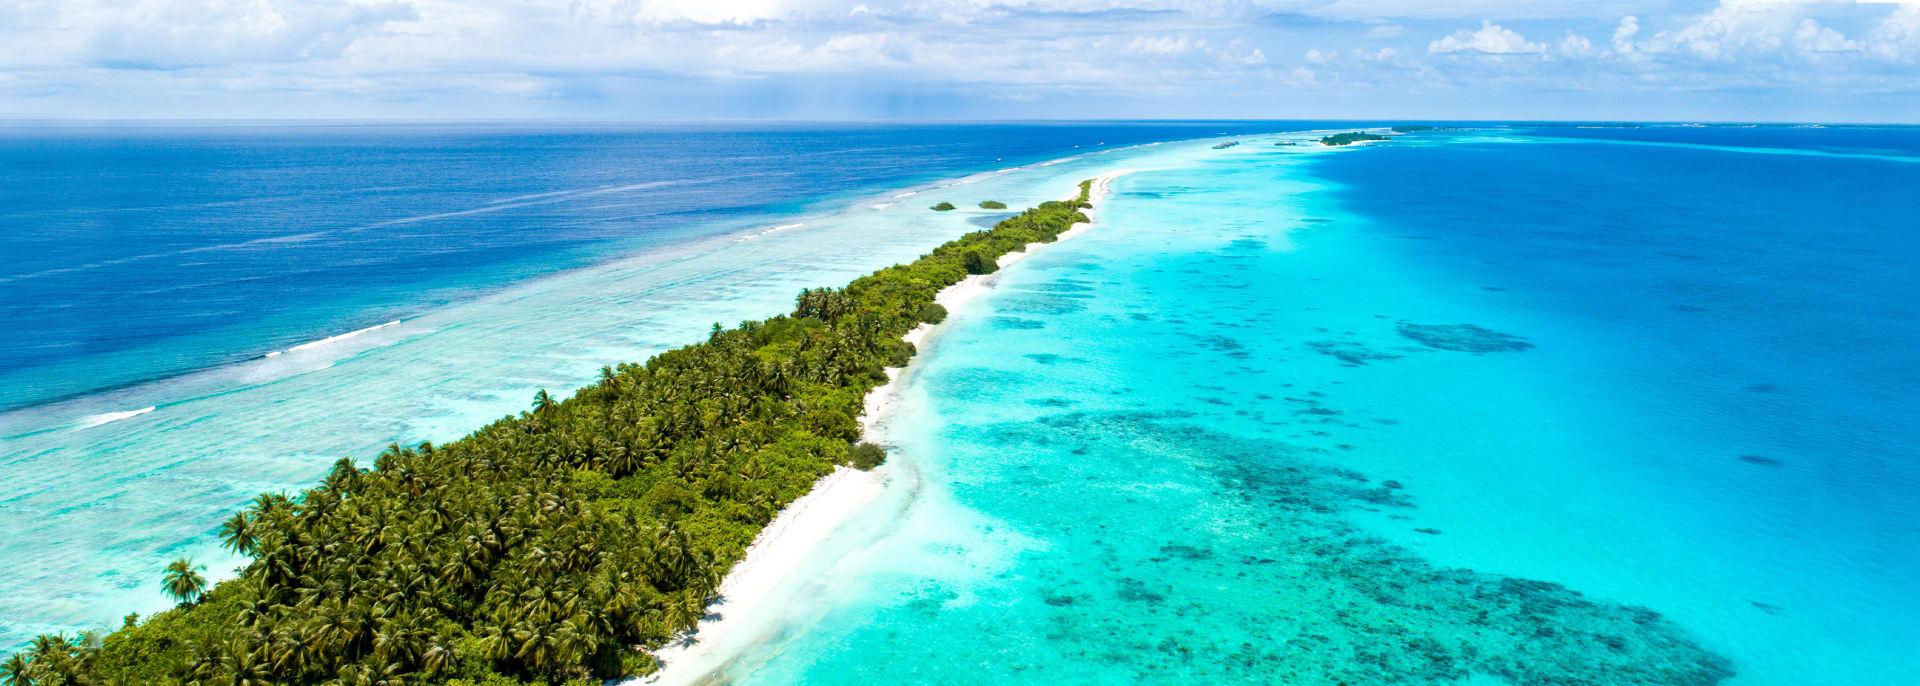 Atolle, Malediven